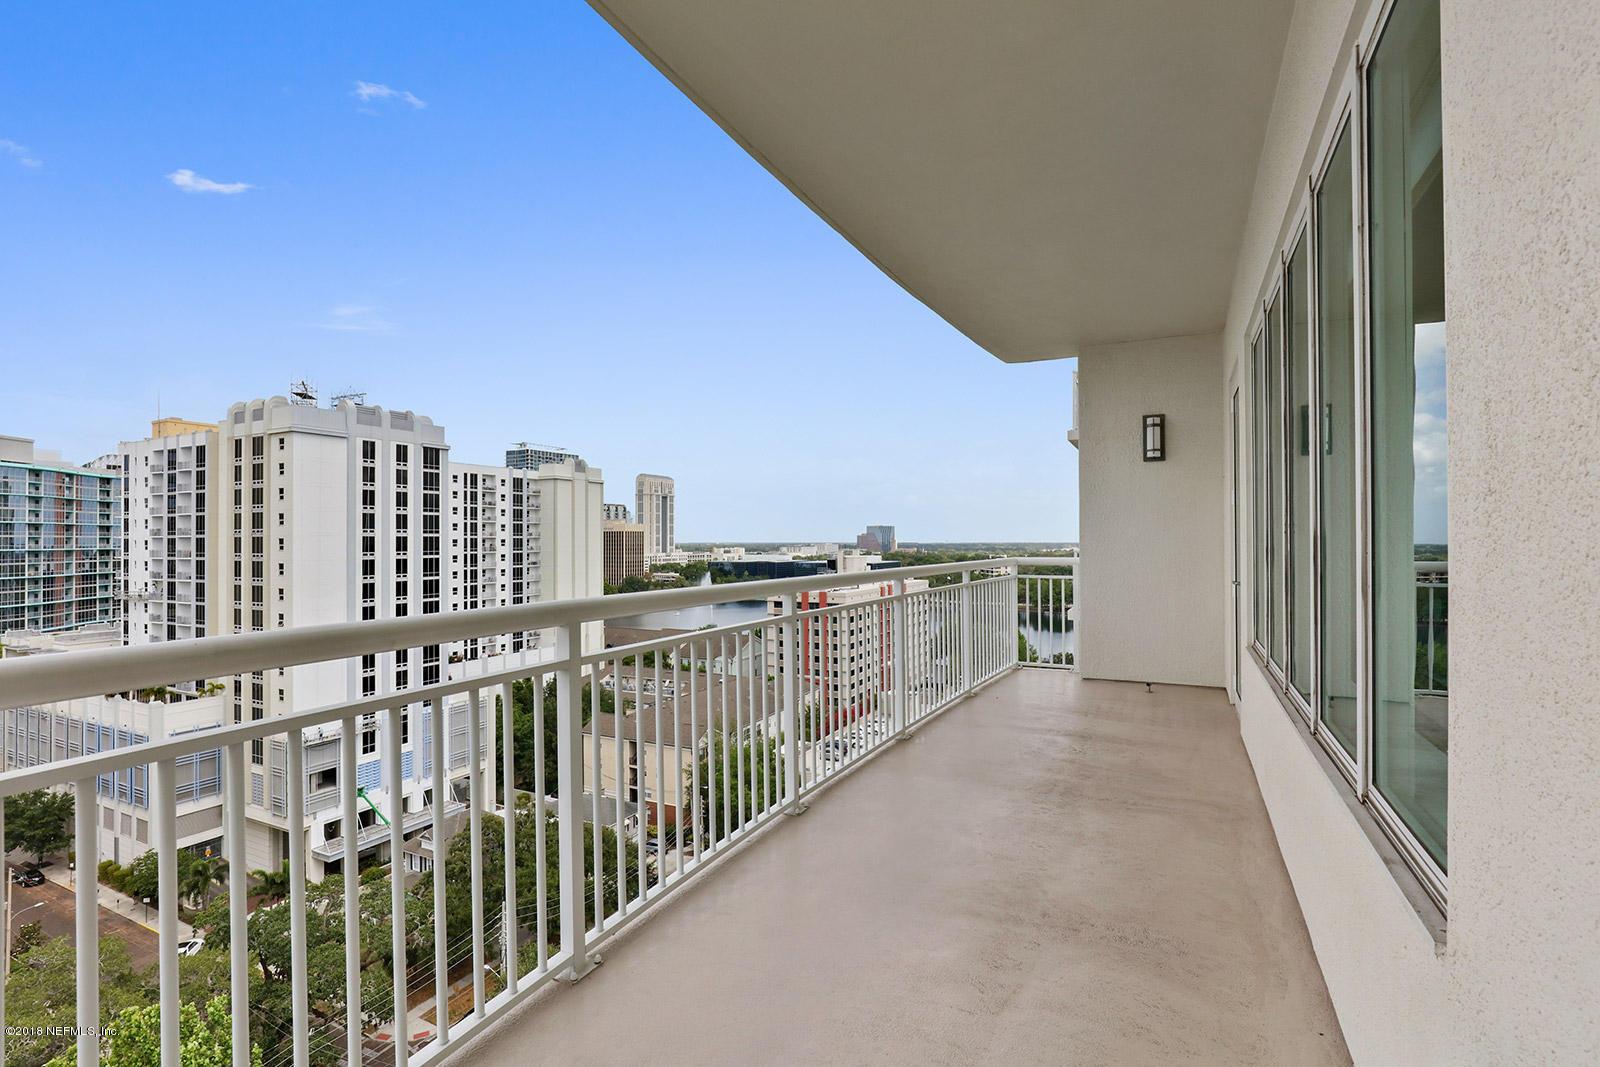 100 EOLA, ORLANDO, FLORIDA 32801, 2 Bedrooms Bedrooms, ,2 BathroomsBathrooms,Residential - condos/townhomes,For sale,EOLA,935245